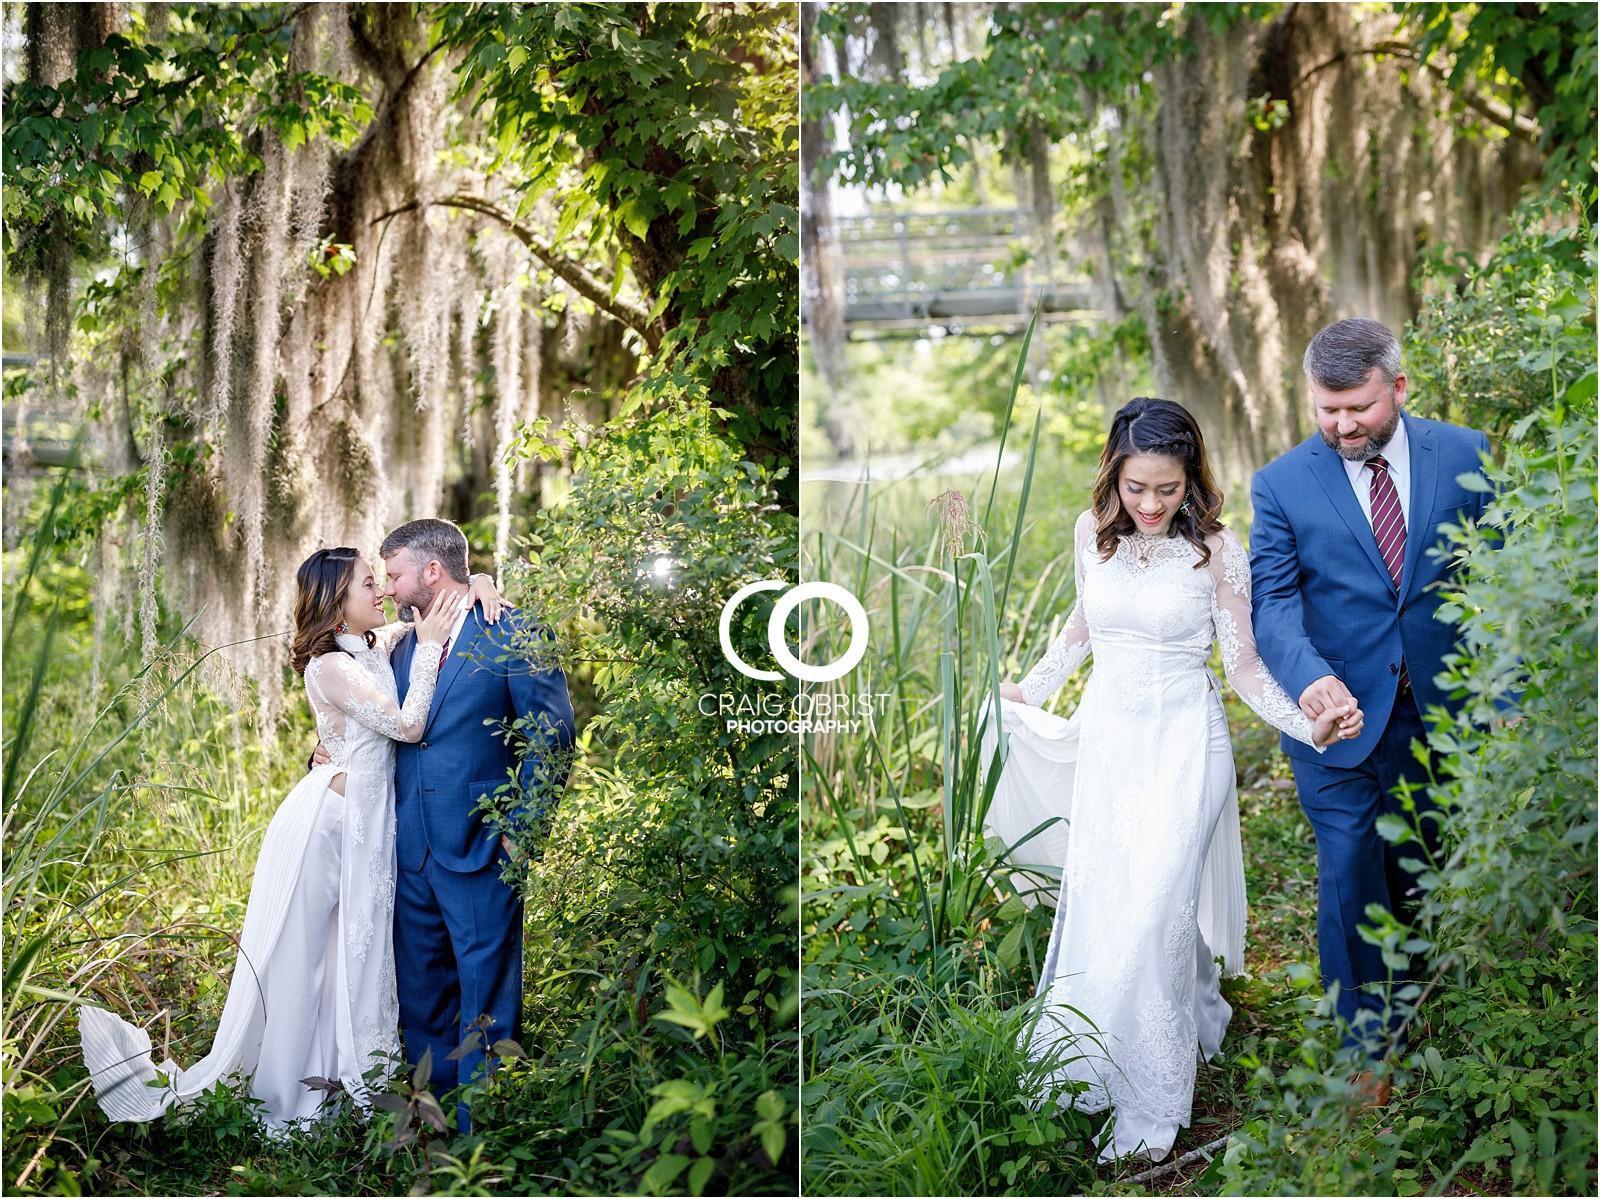 Savannah River Rapids Augusta Rain Buckhead Engagement Portraits_0010.jpg